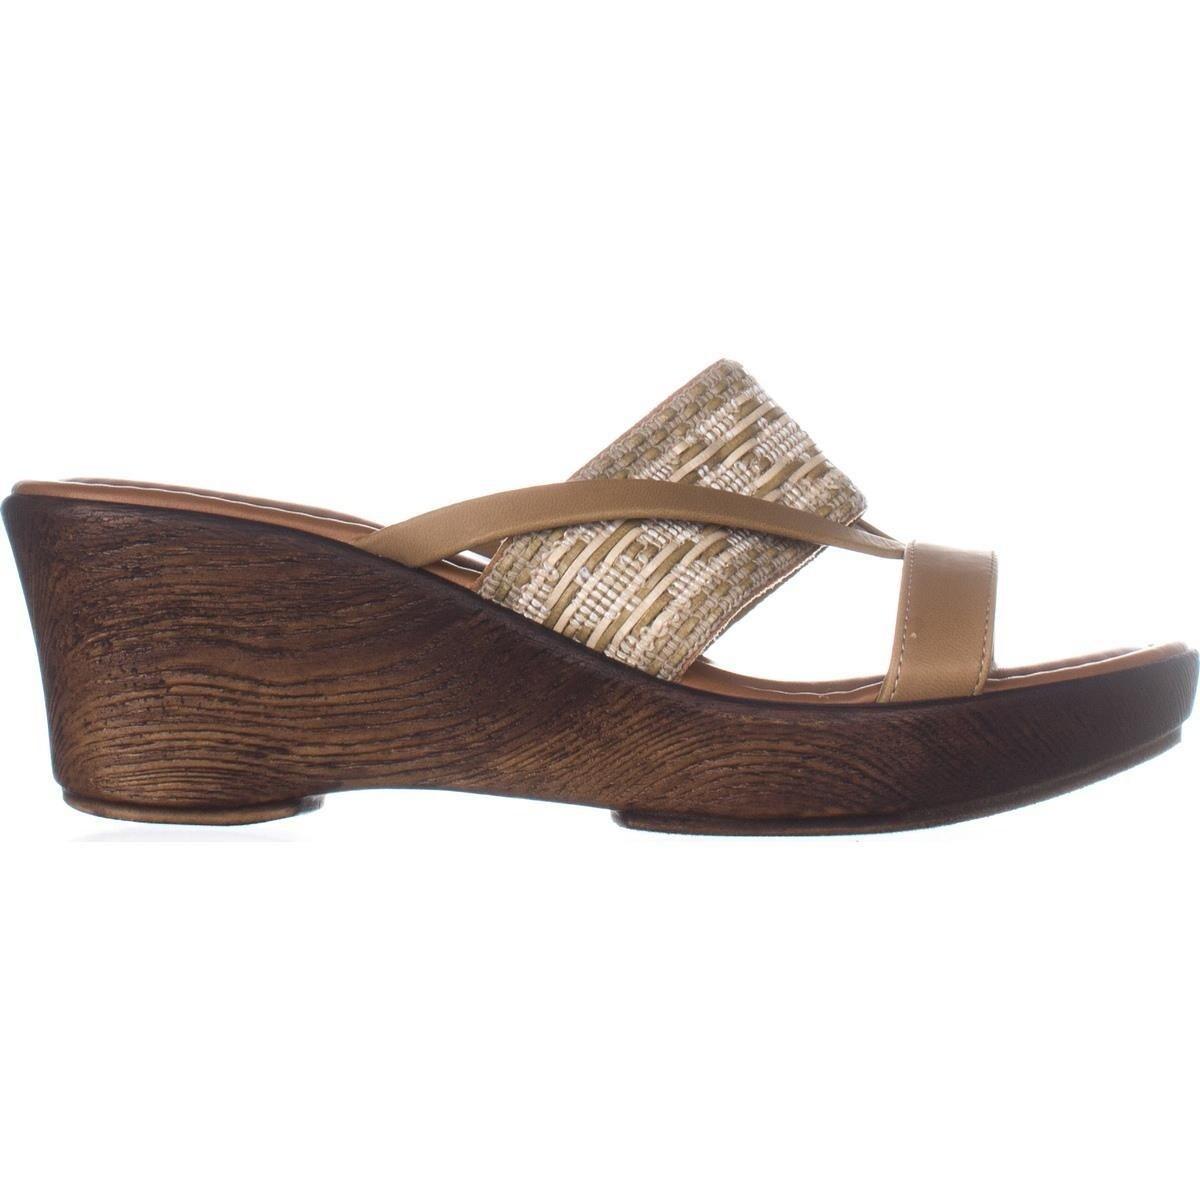 76bdb6d70c96 Shop Tuscany Easy Street Rachele Comfort Wedge Sandals